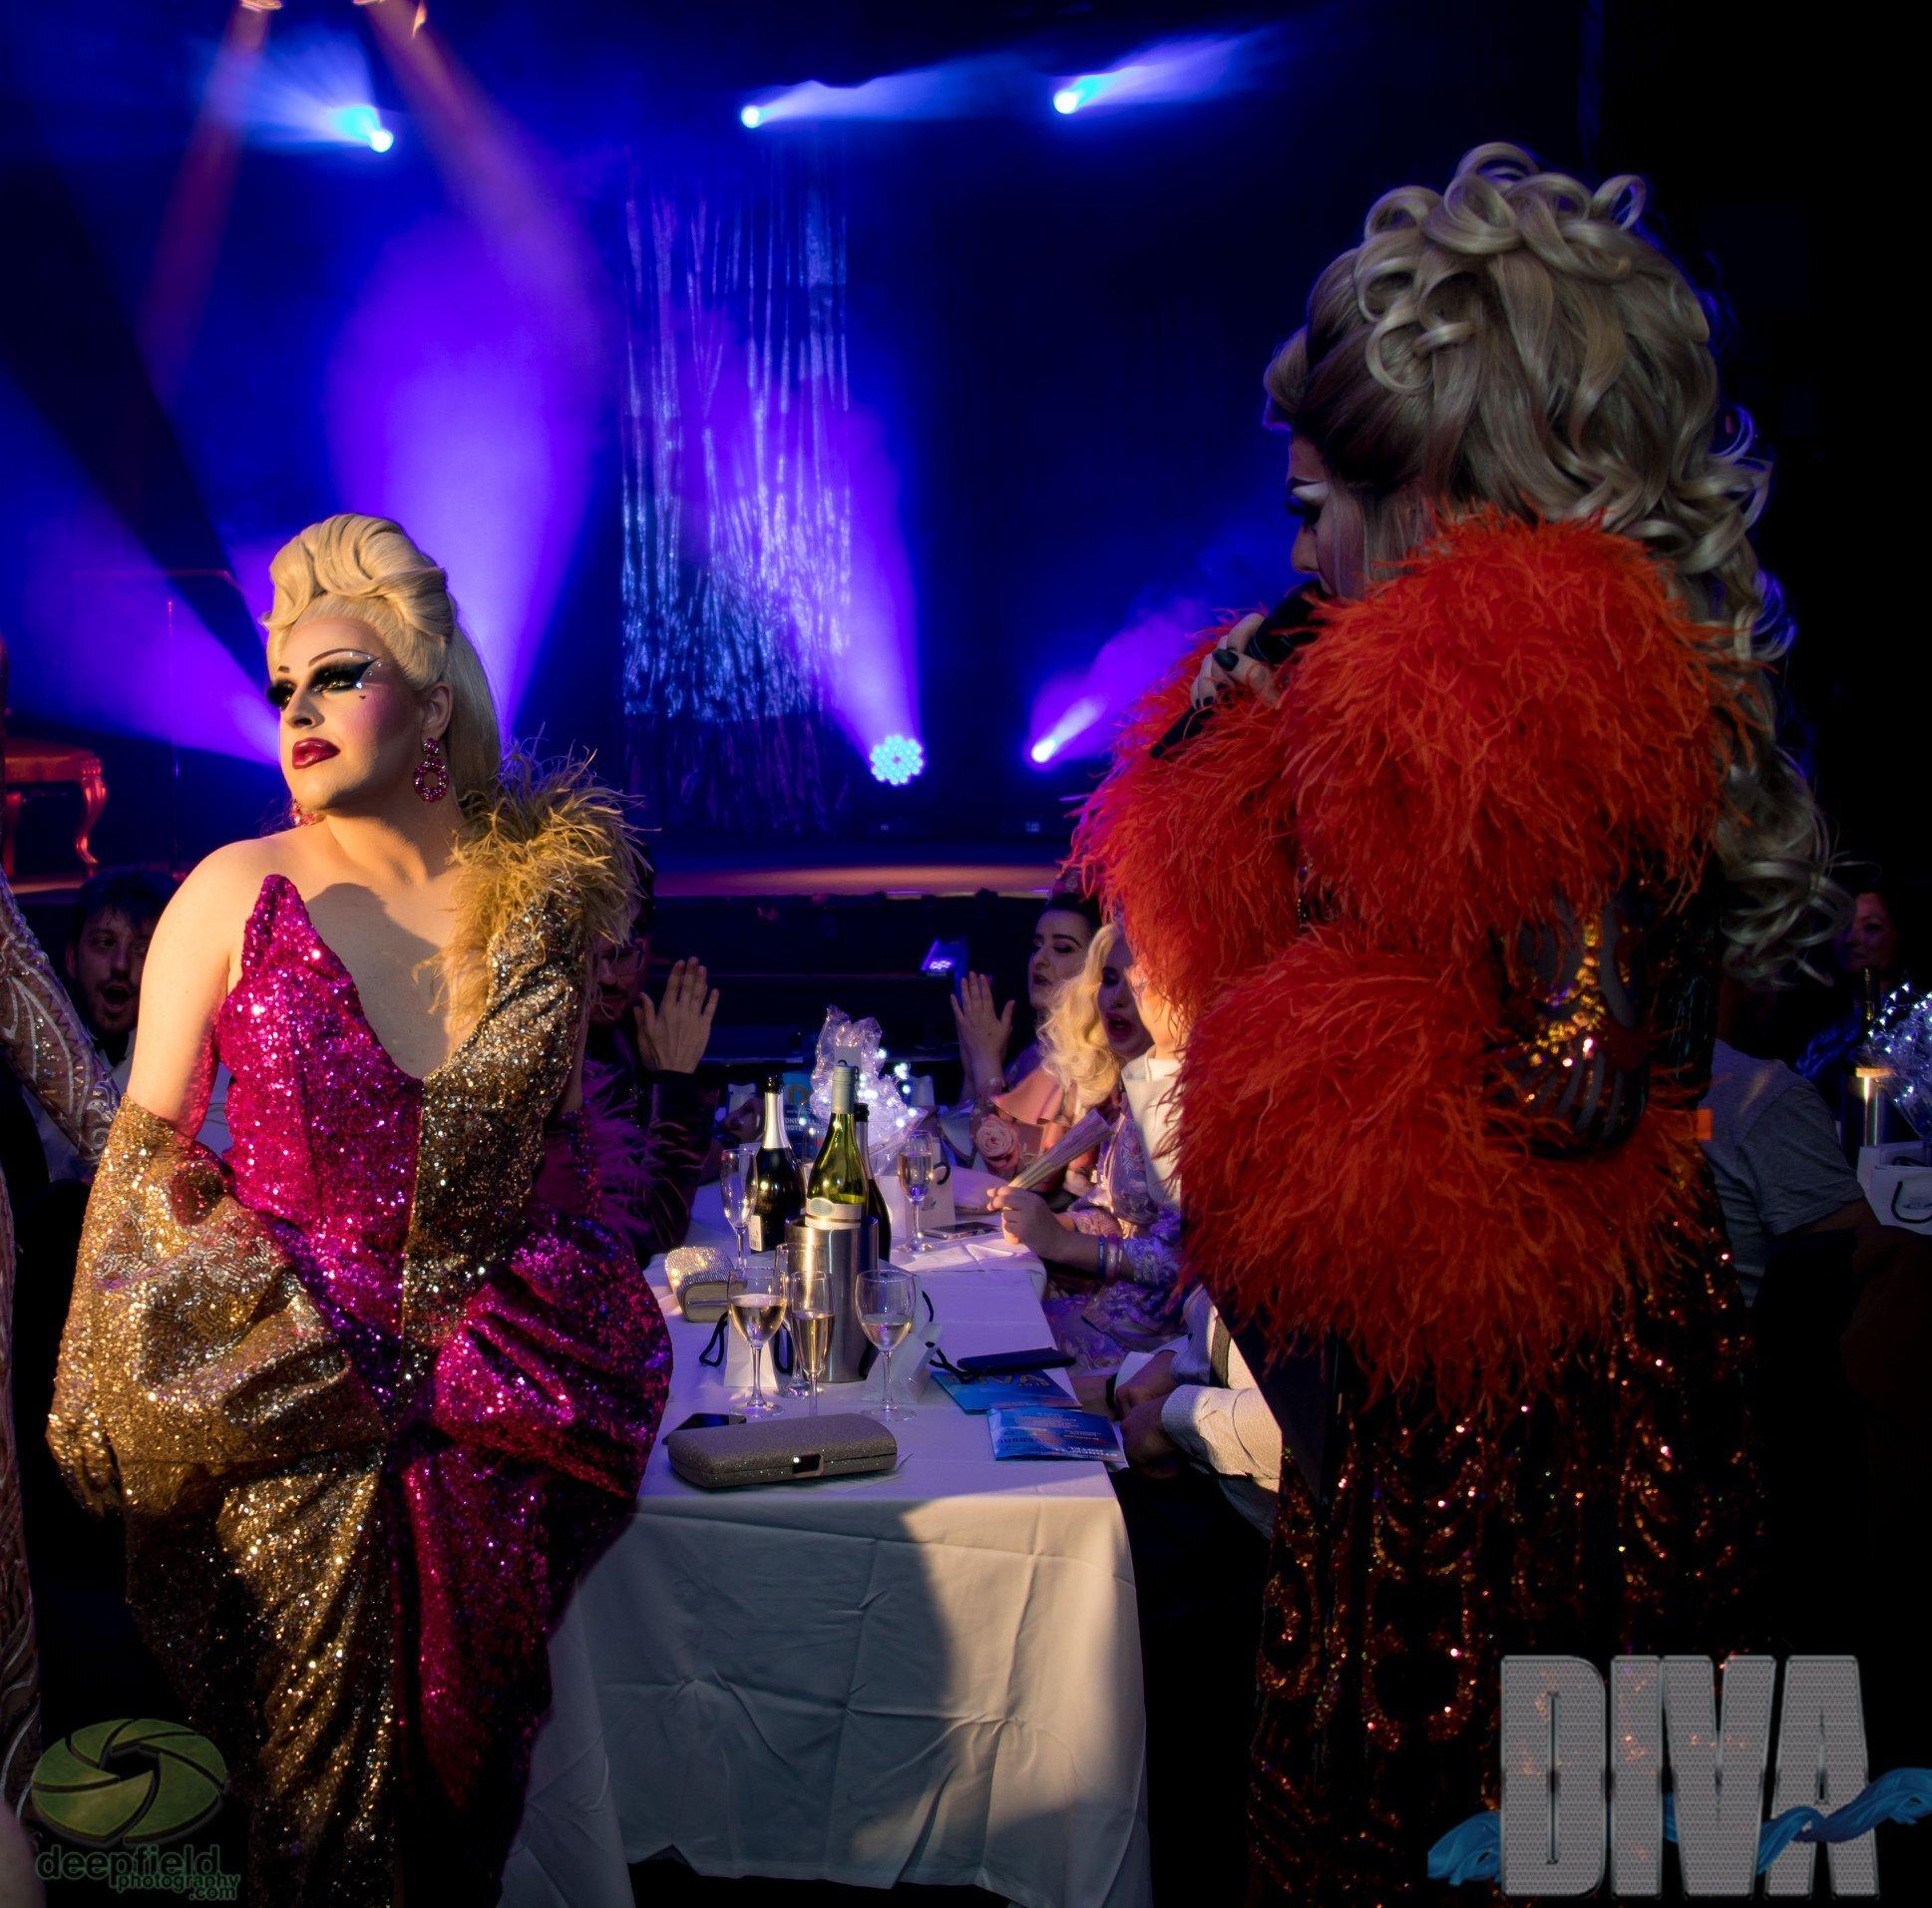 charisma-belle-corporate-host-event-hosting-hannah-conda-diva-awards-sydney-drag-queen-royalty-best-hire-drag-race-australia.jpg